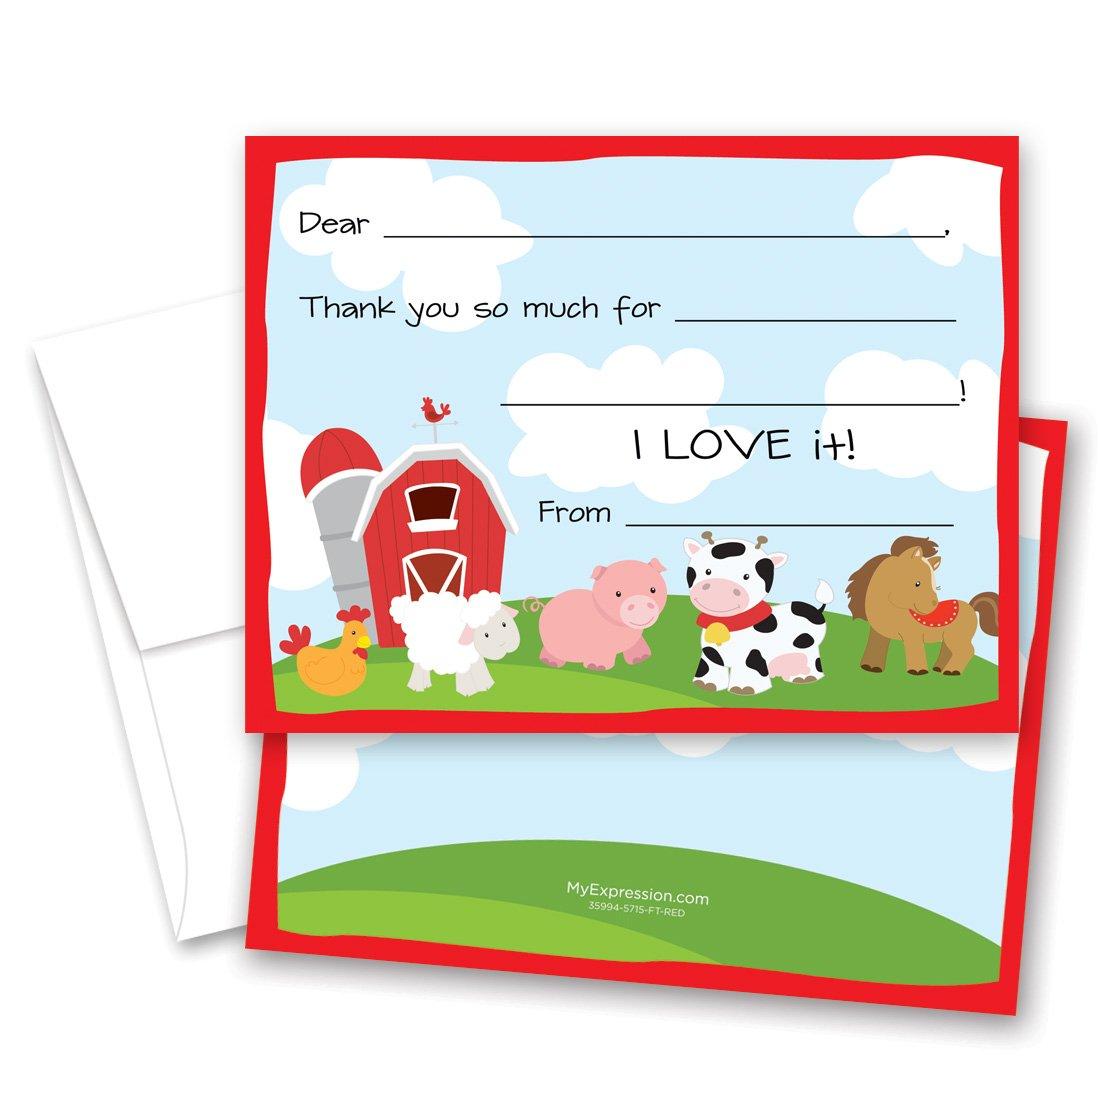 MyExpression.com 20 Barnyard Fill-in Children Birthday Thank You Cards